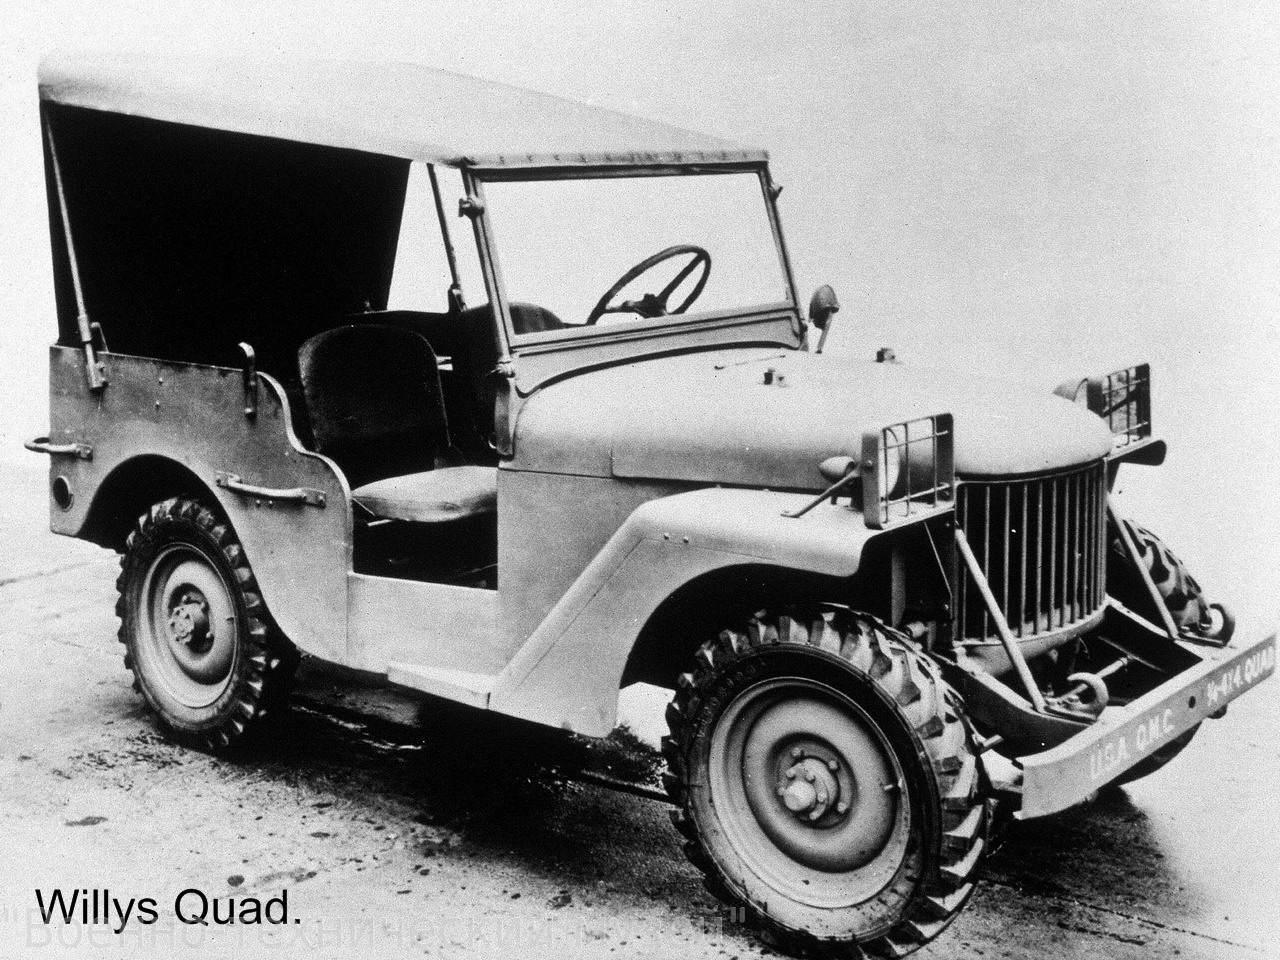 willys quad 2 - La Jeep Willys-Overland quad